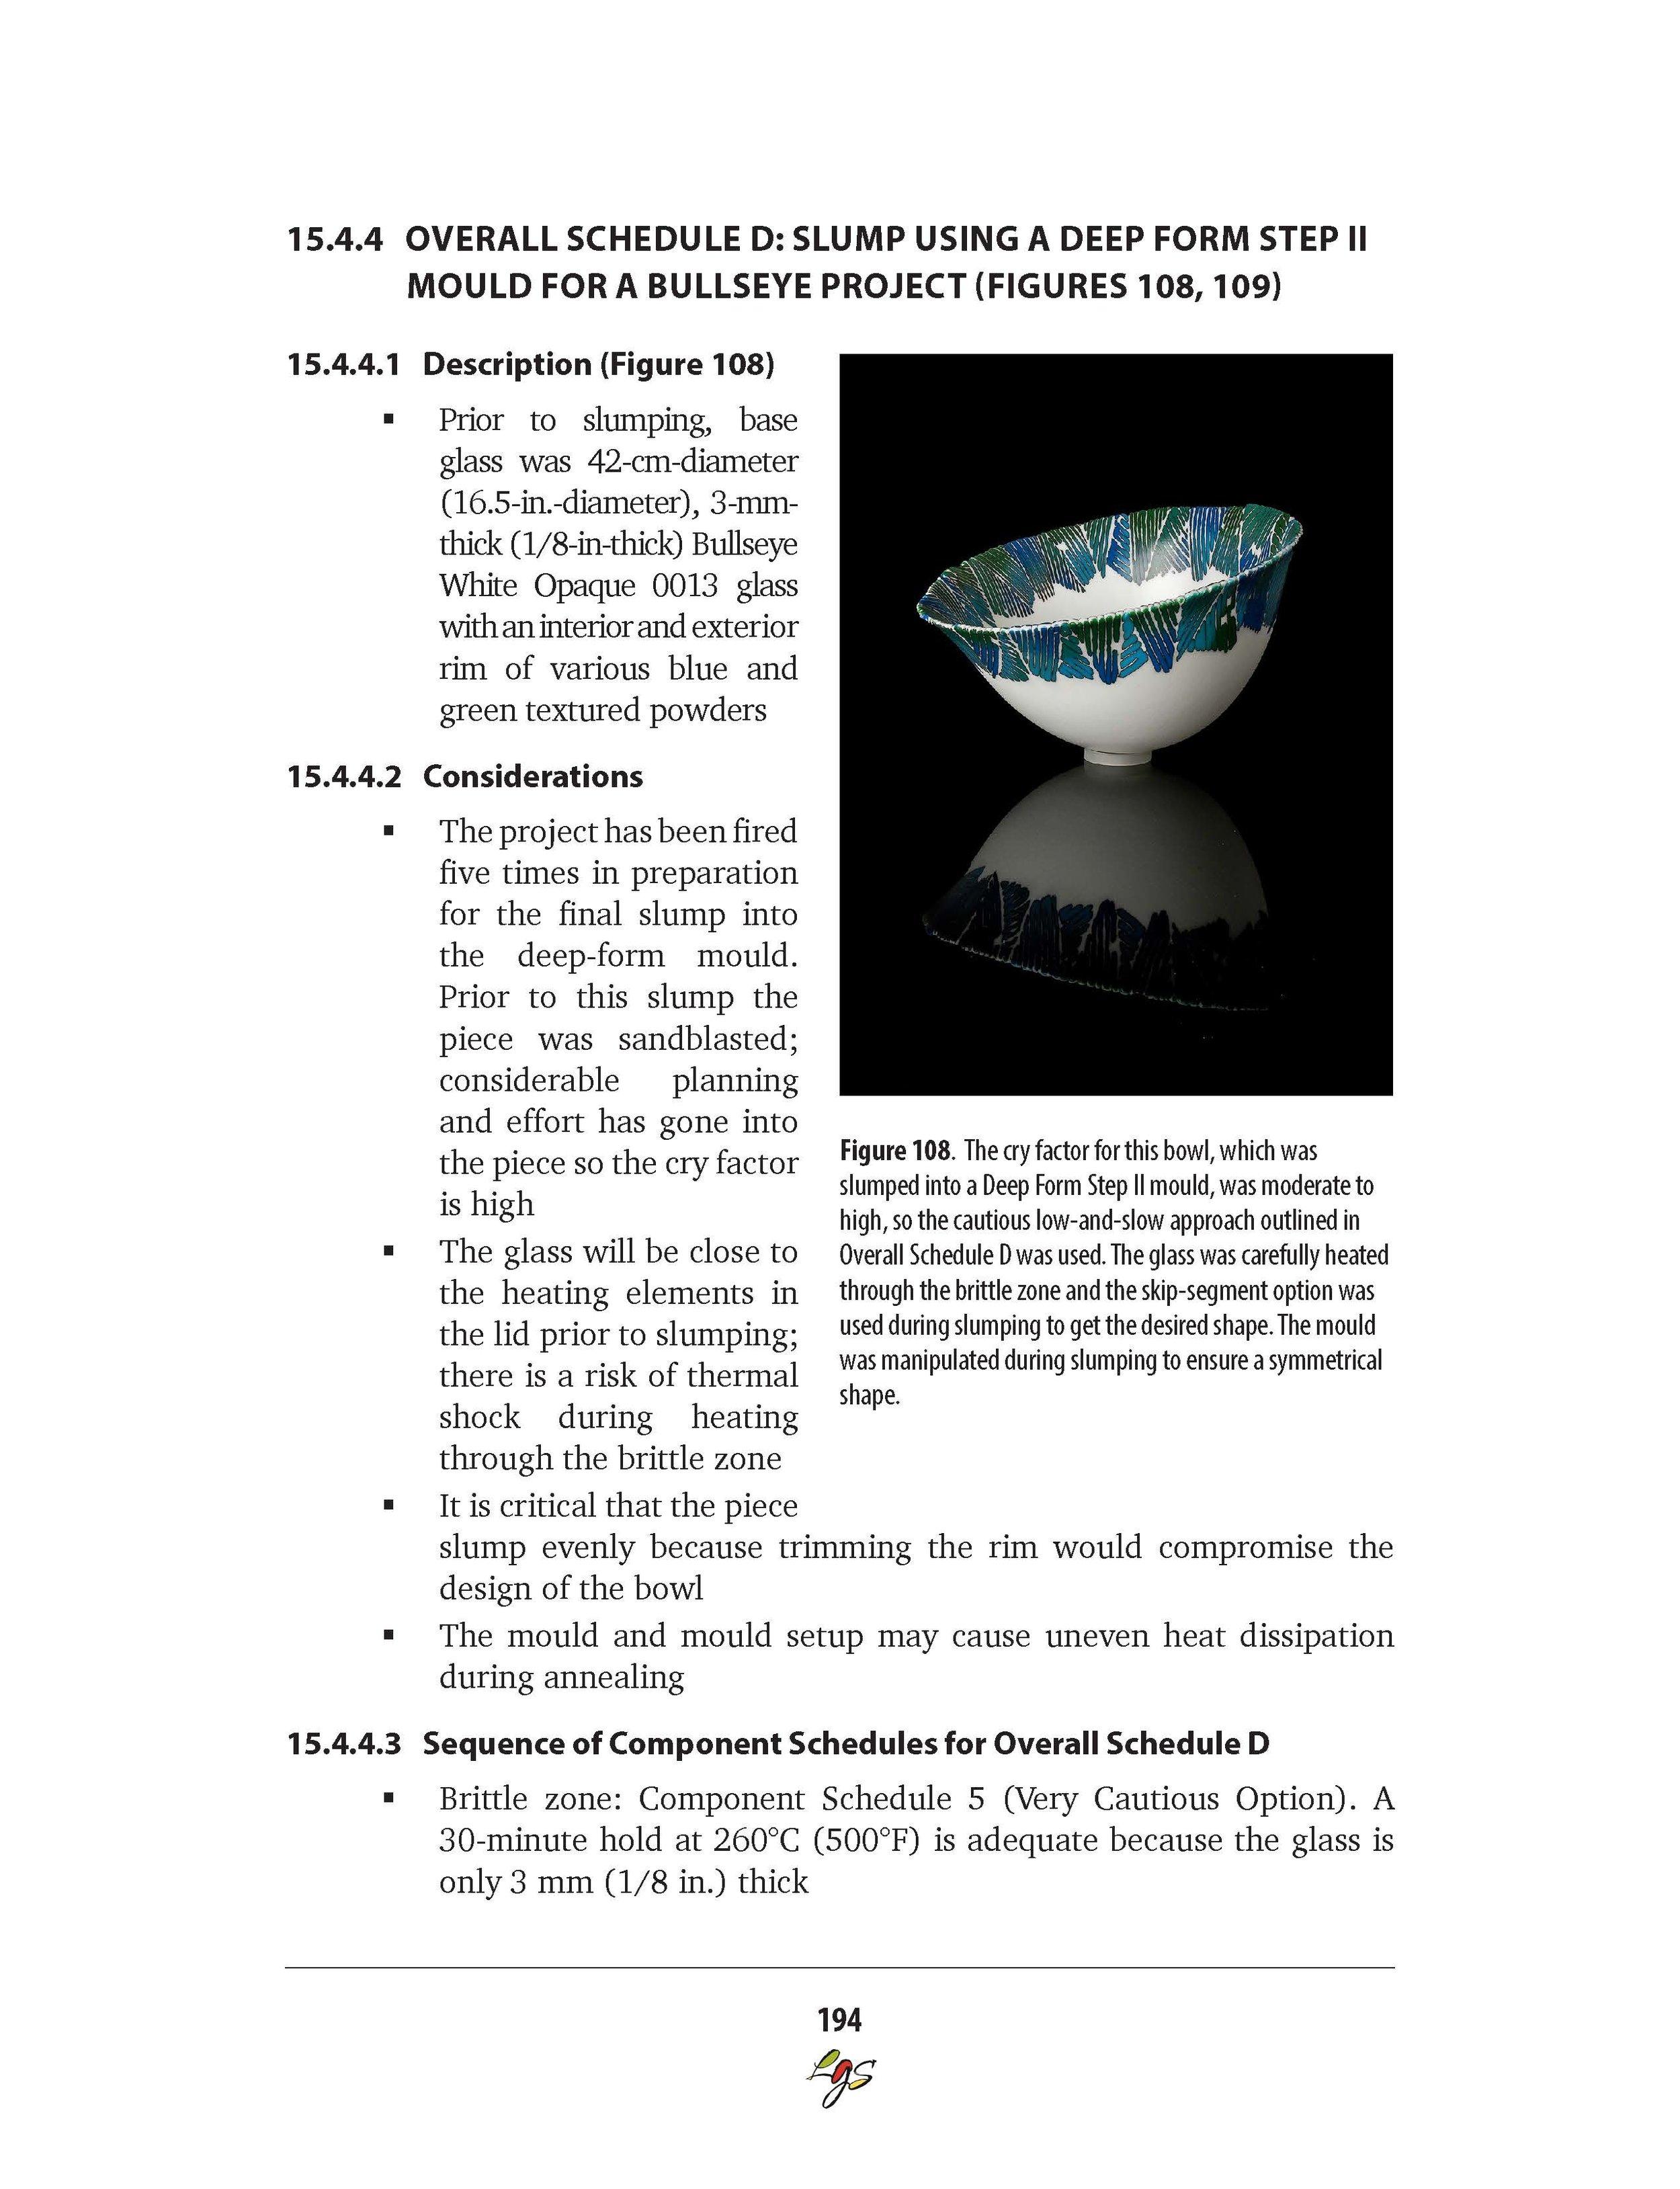 LGS Firing Schedules for Kilnformed Glass_large 194.jpg